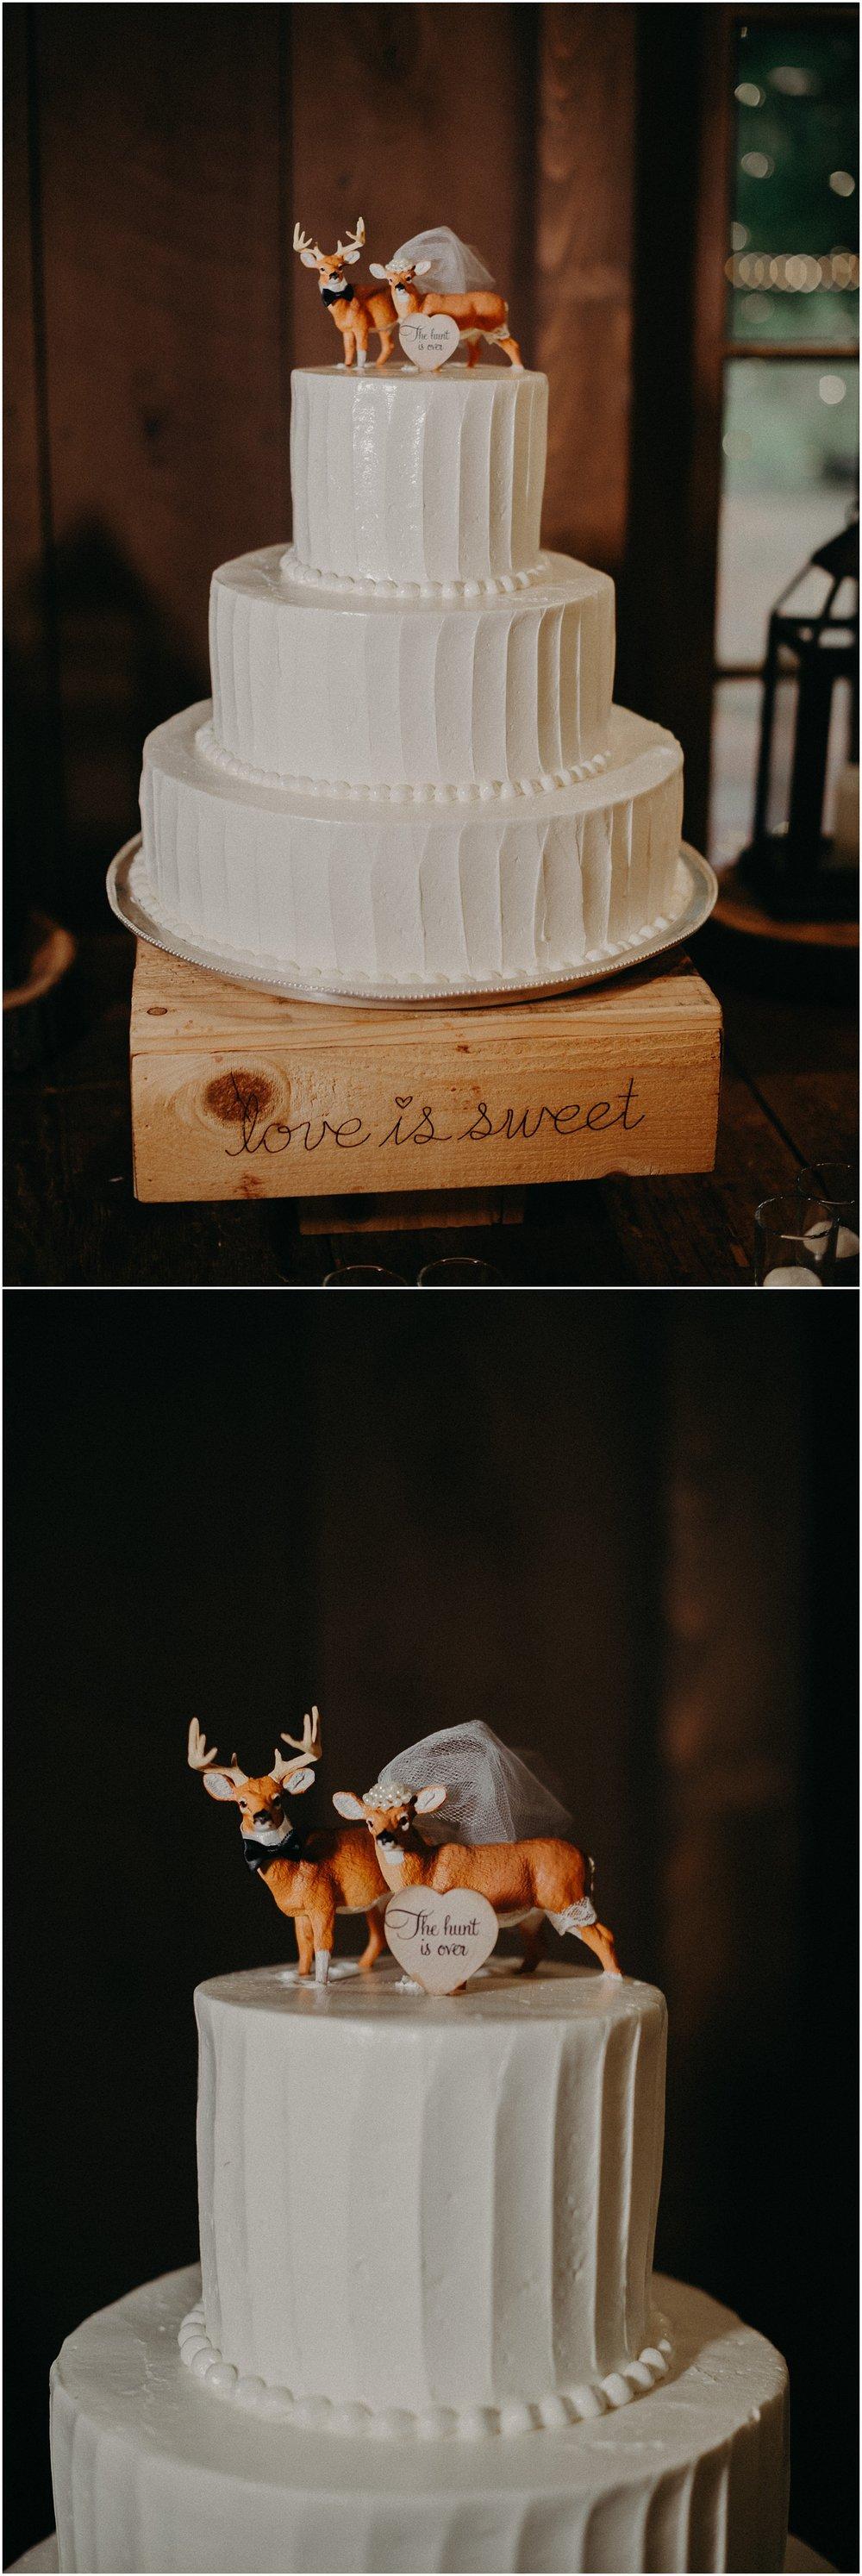 waterloo-village-waterloo village-wedding-outdoor wedding-rustic-boemian-new jersey-bride-groom-wedding party-davids bridal-wedding dress-wedding-first kiss-intimate wedding_0387.jpg